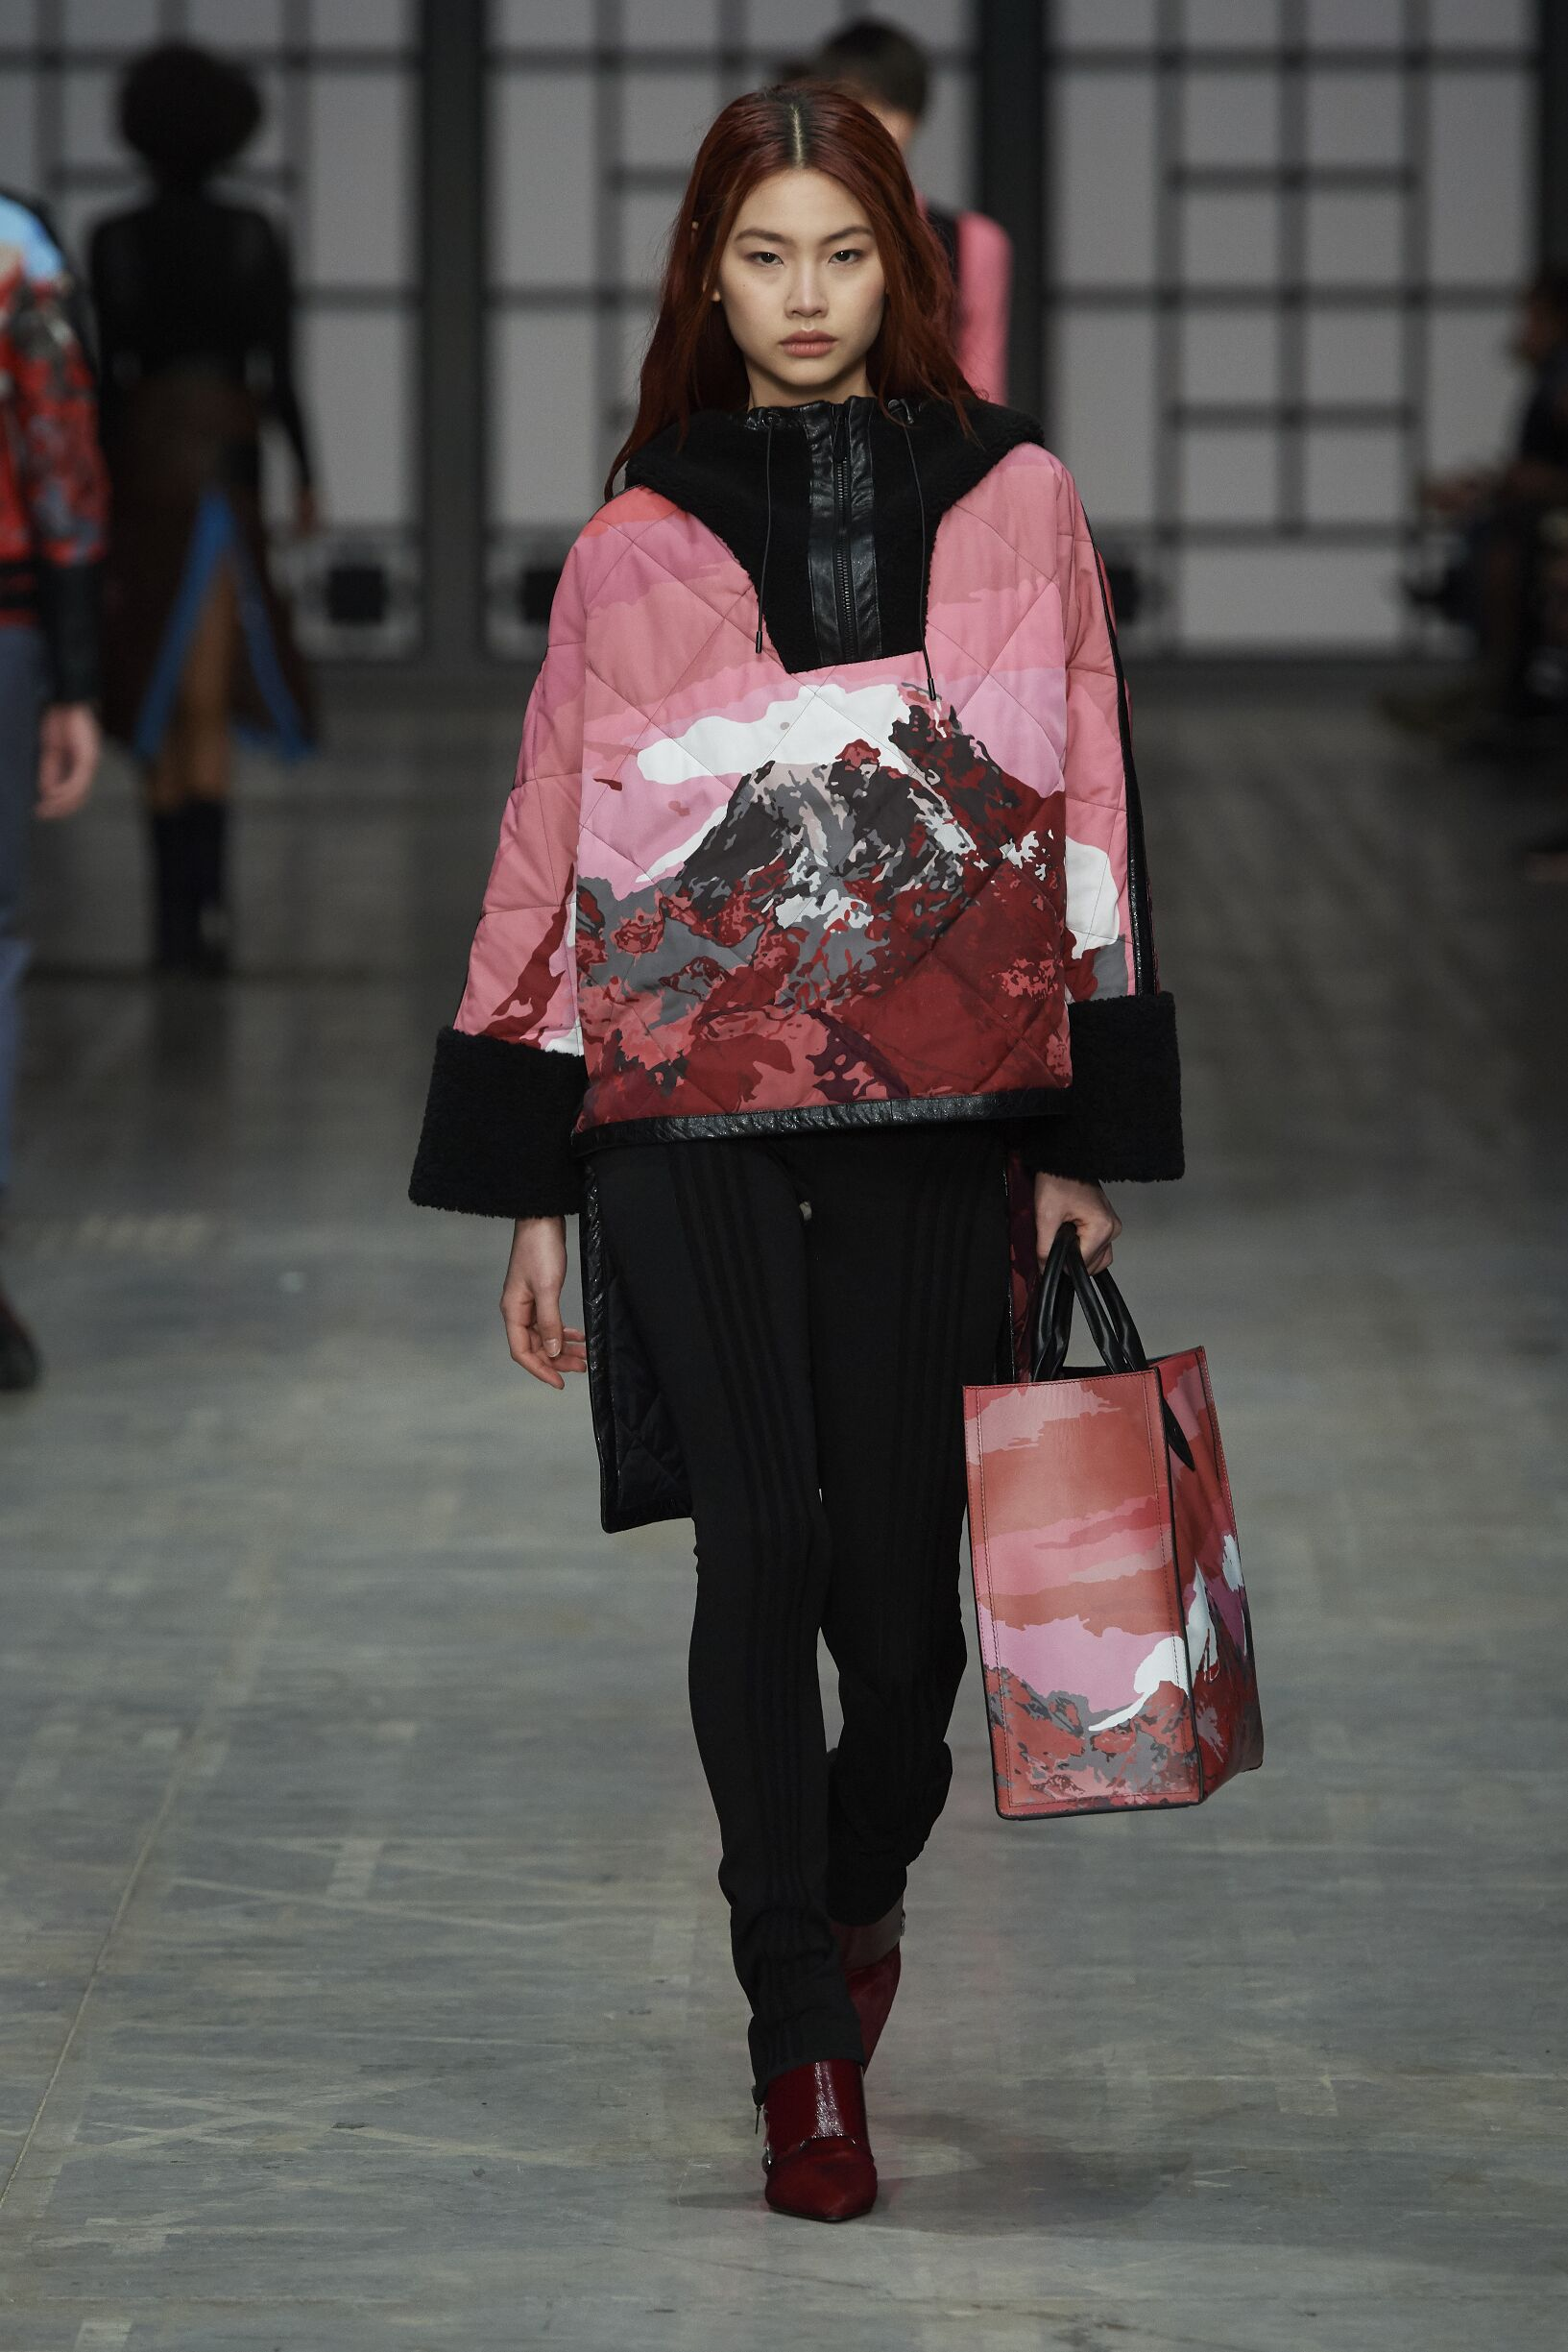 Model Catwalk Trussardi